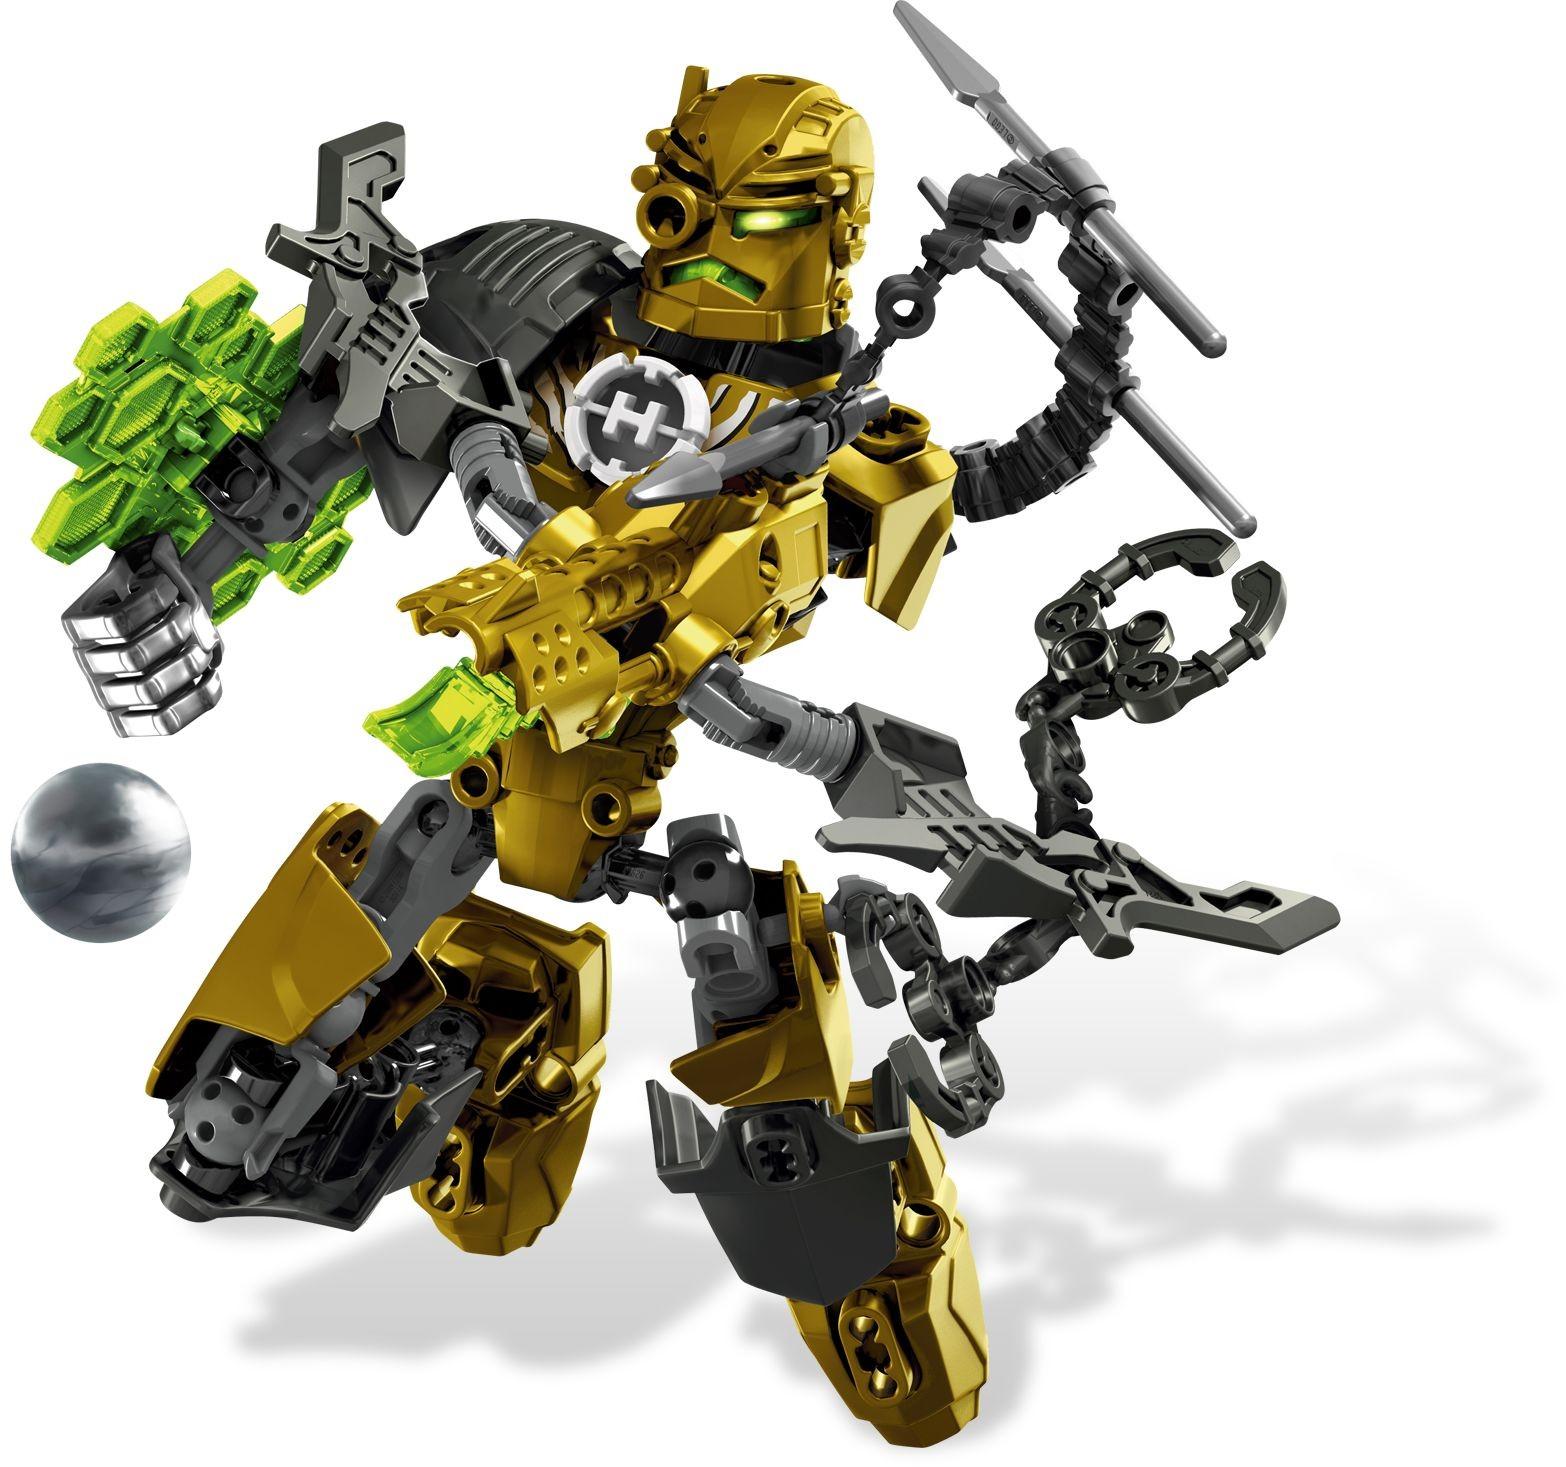 Lego hero factory characters